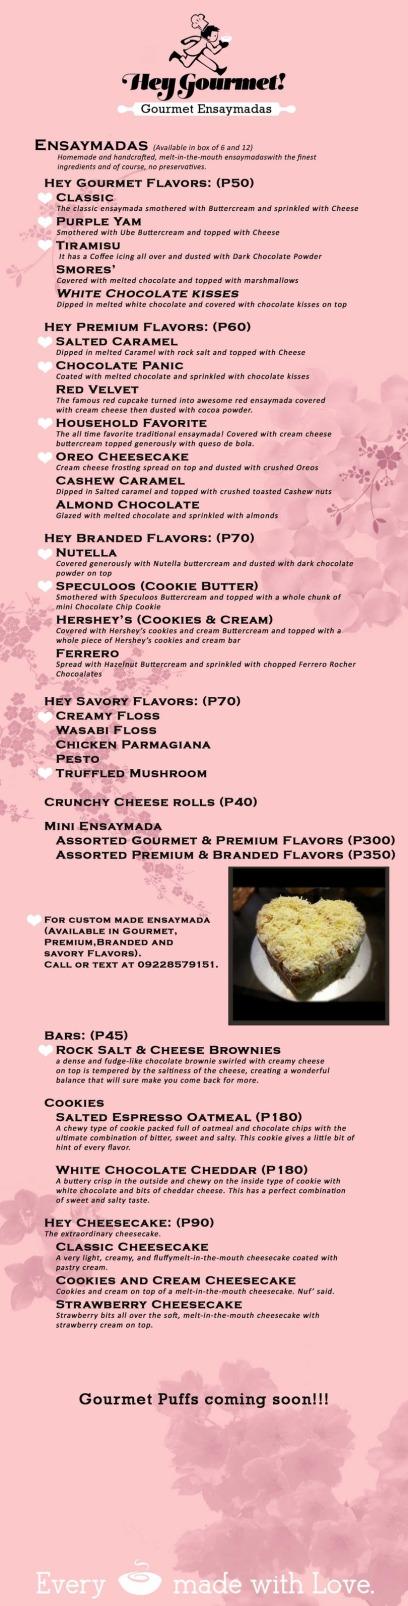 Hey Gourmet! Gourmet Ensaymadas menu